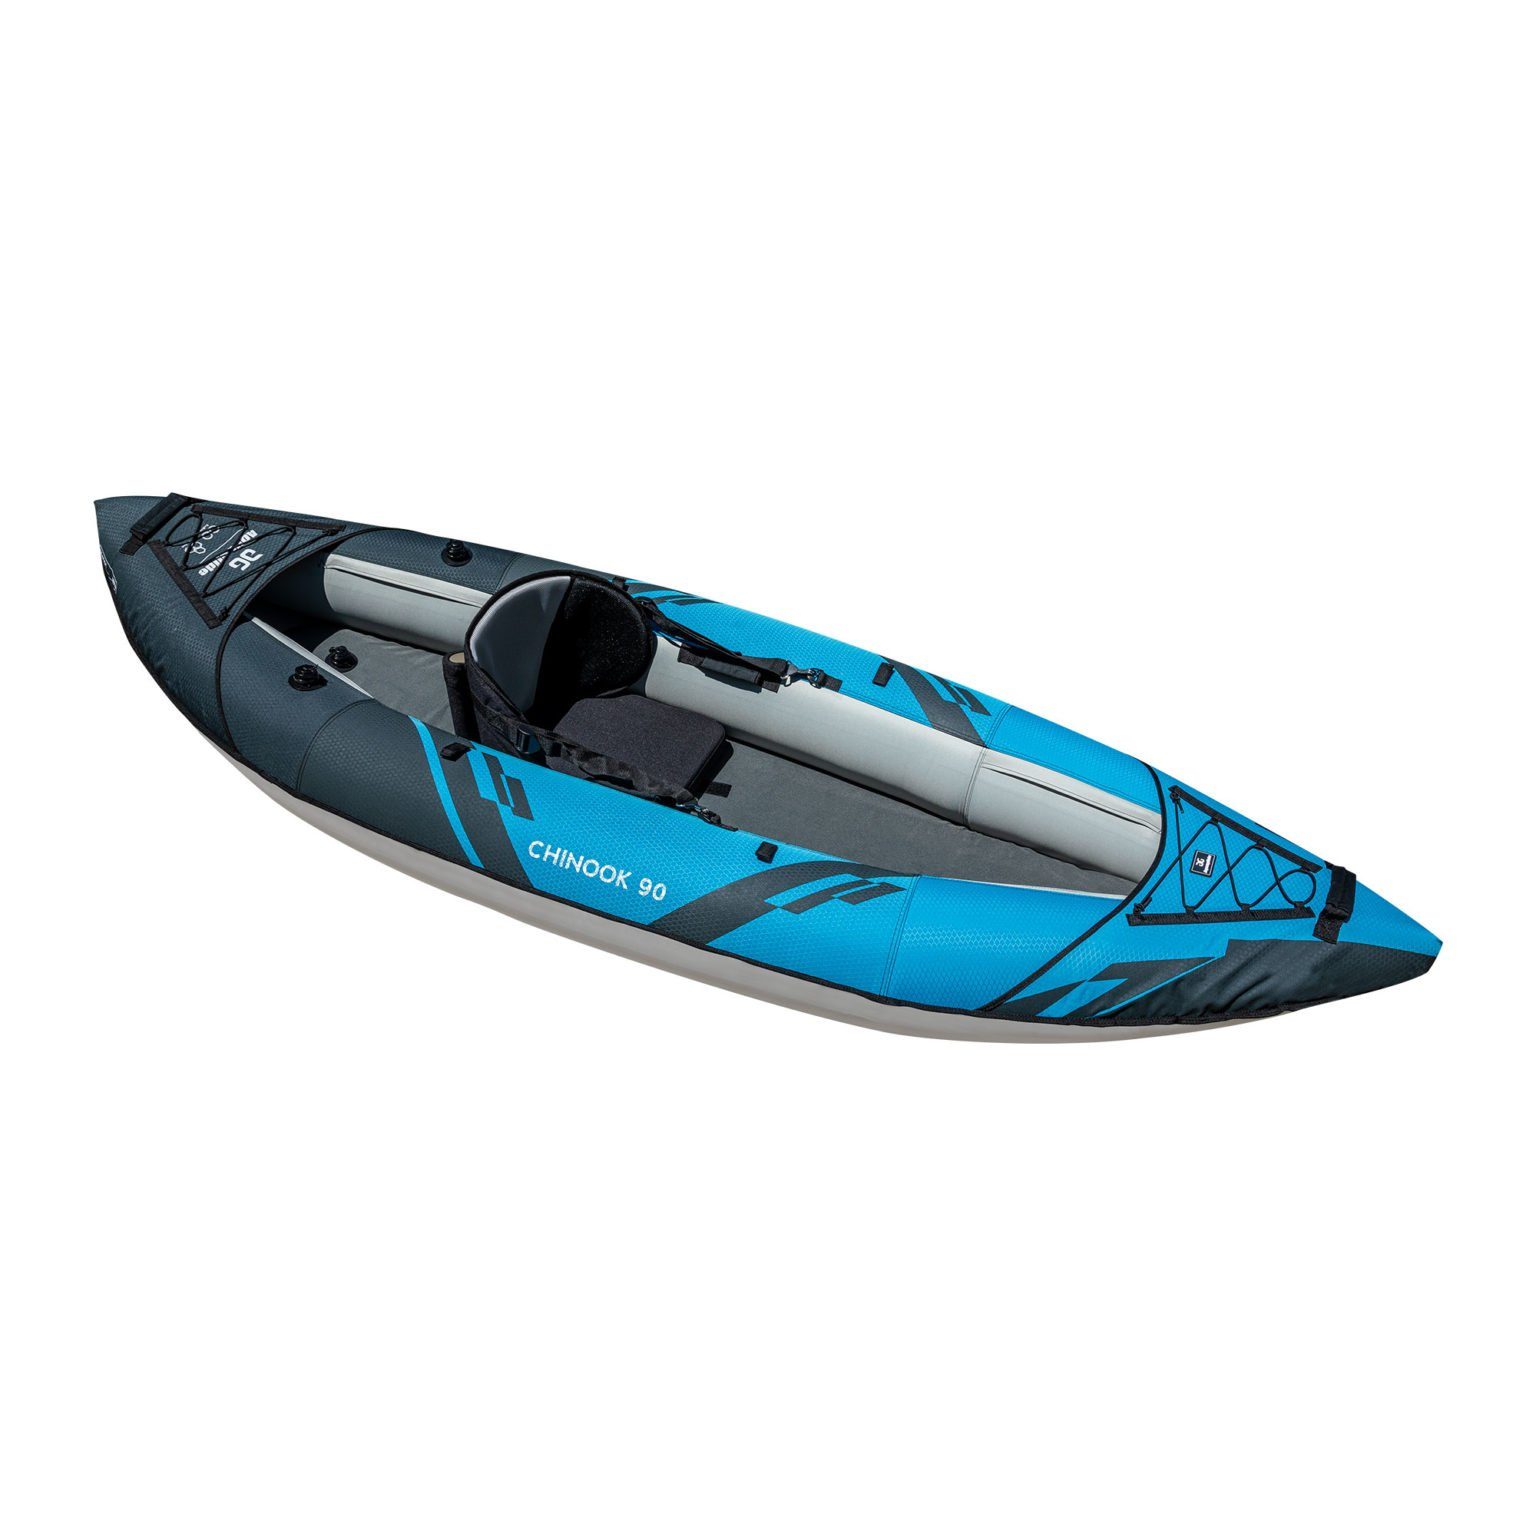 Aquaglide Chinook 90